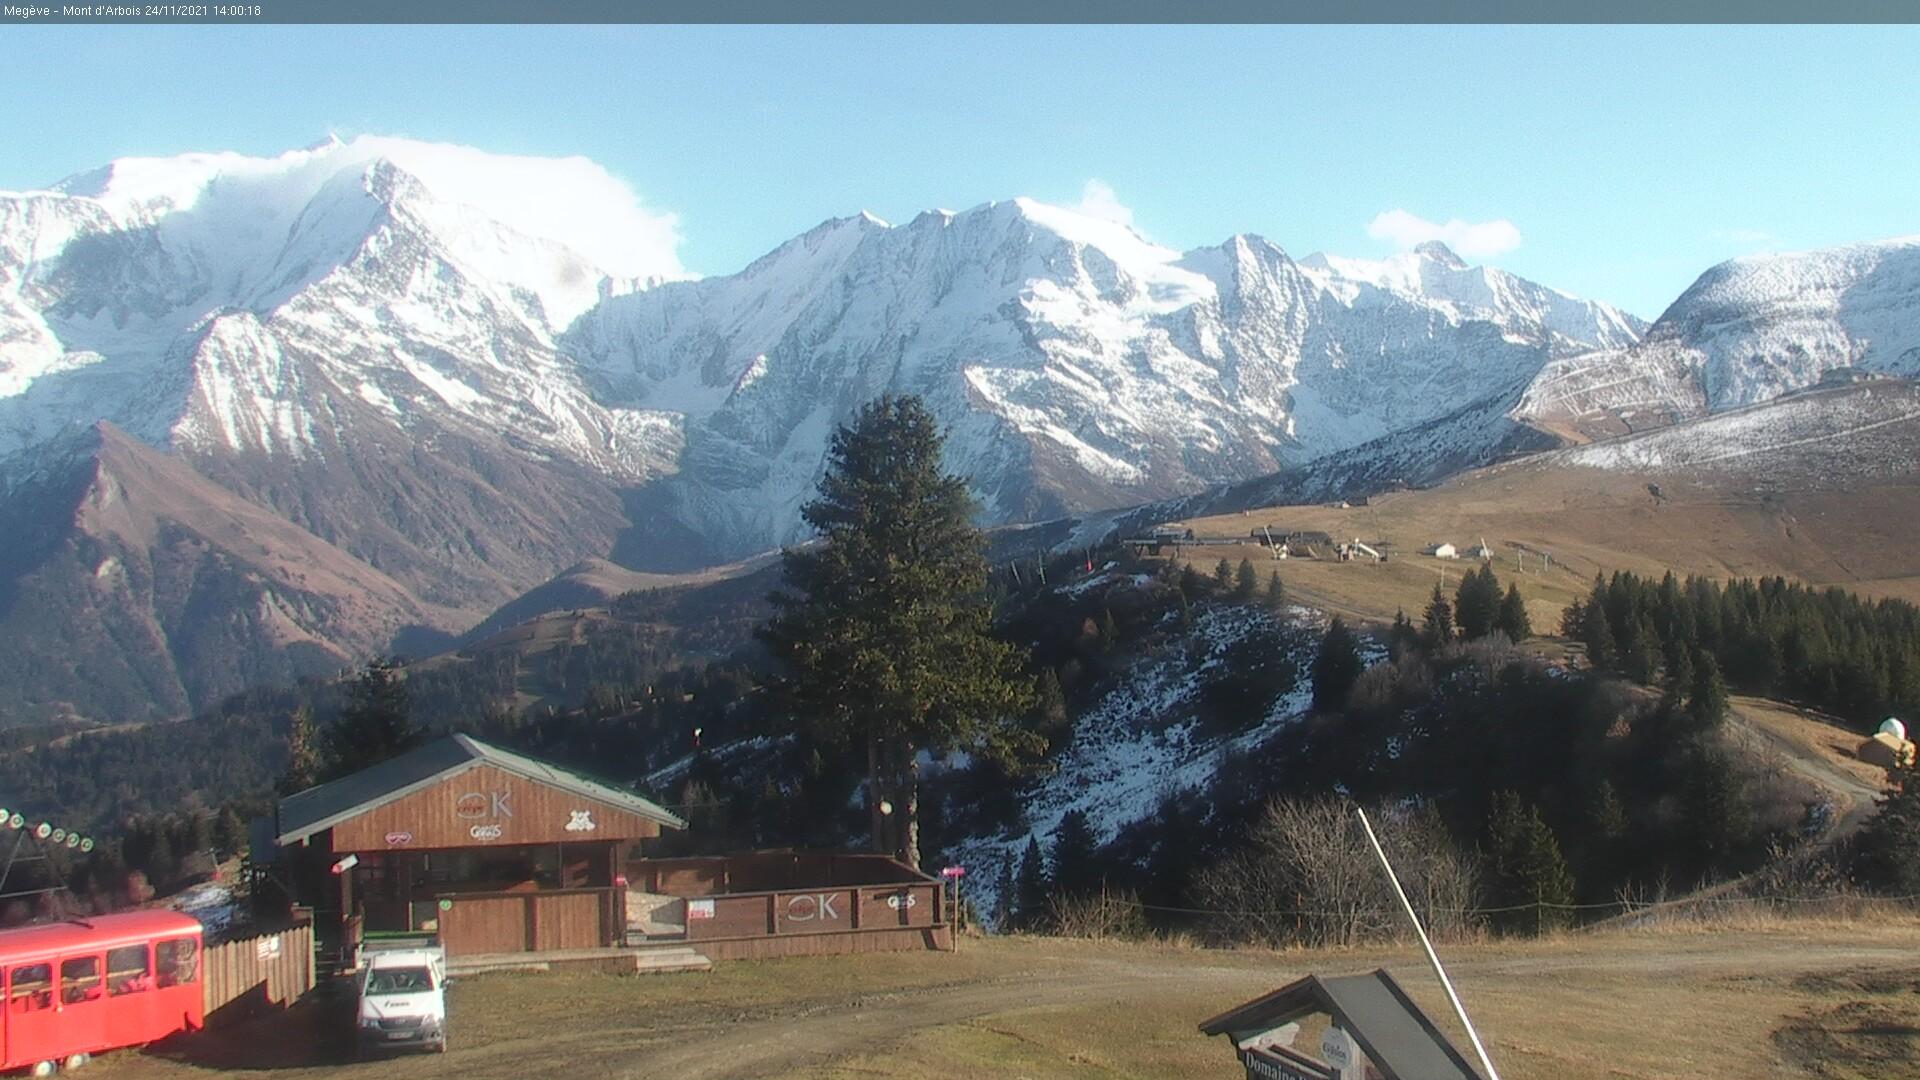 Webkamera Saint-Gervais–Mont Blanc